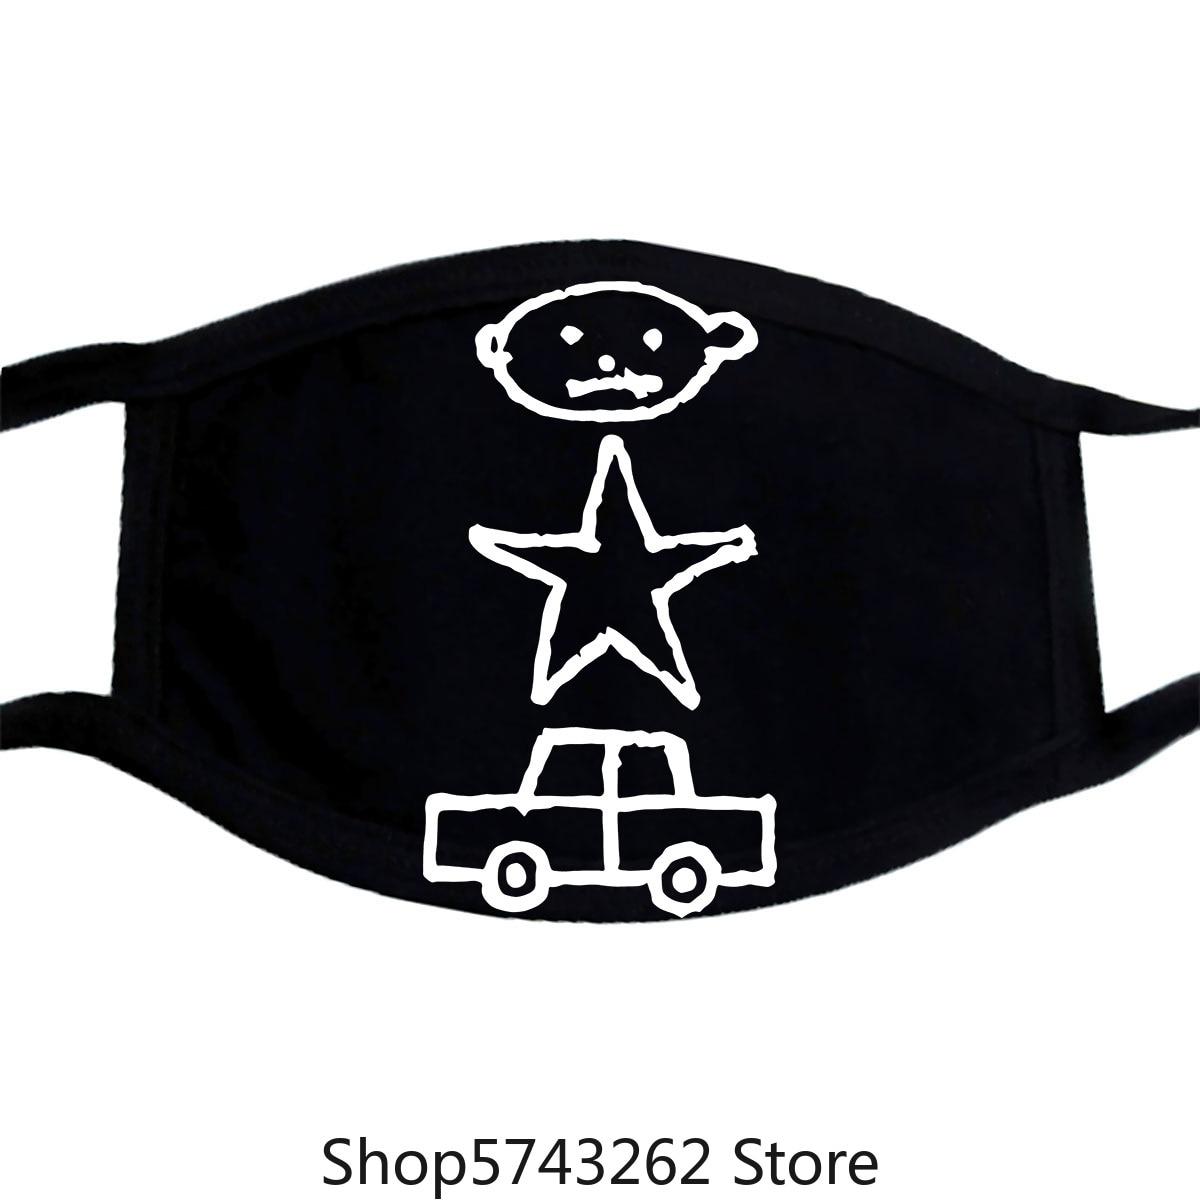 Mask U2 Zoo Tv Tour 1991 Streetwear Size S-3Xl Washable Reusable Mask For Unisex Black